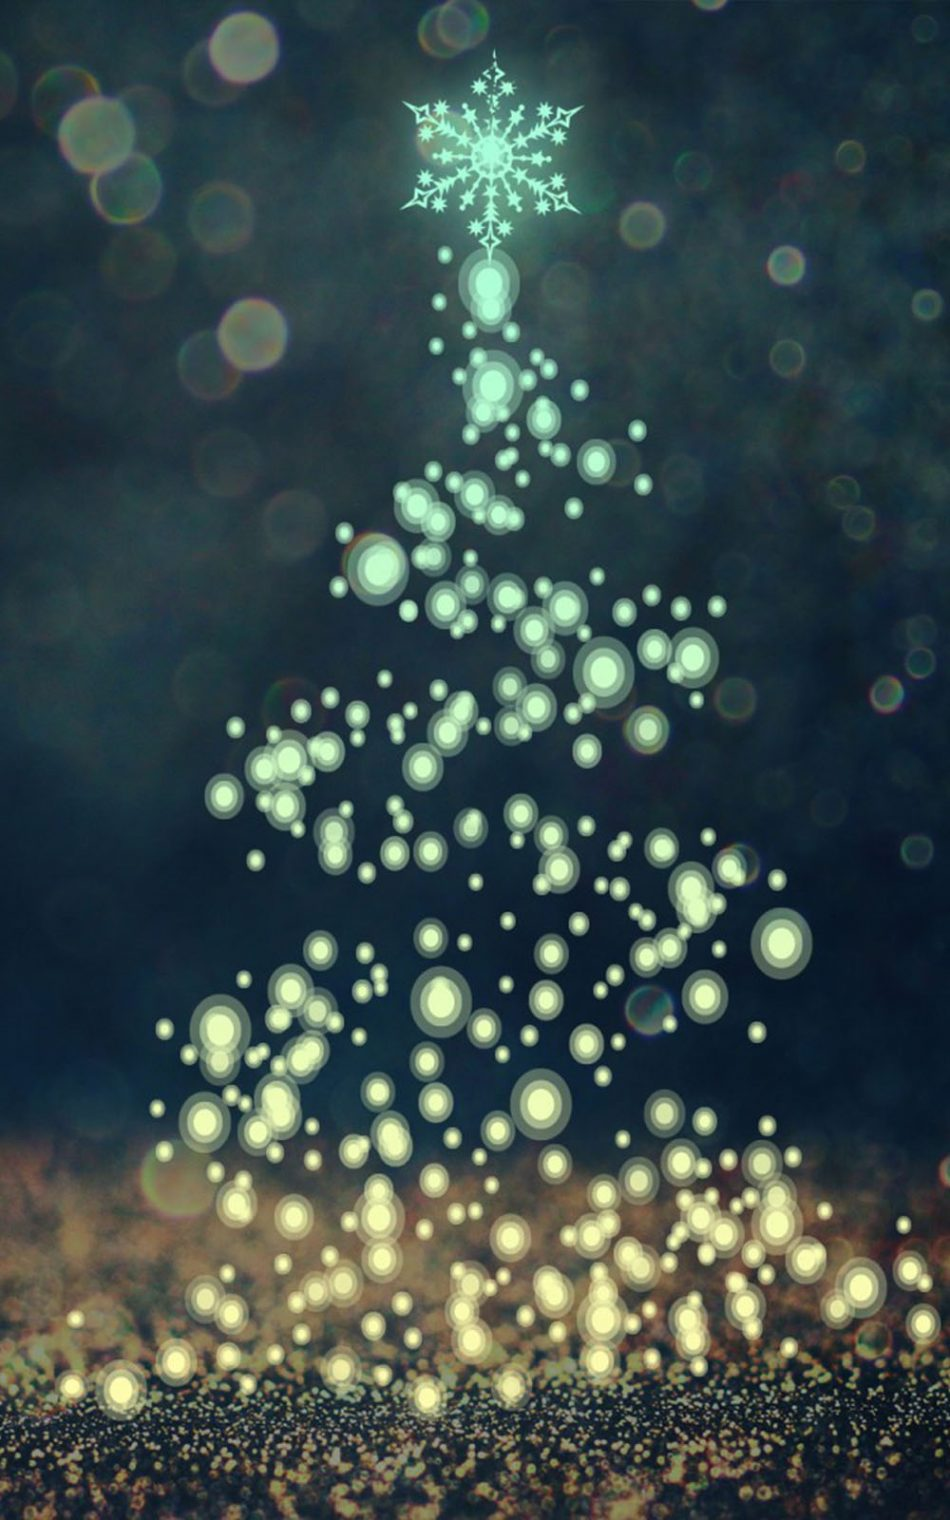 Fortnite Christmas Tree Background.Download Christmas Tree Crystal Sparkles Cgi Free Pure 4k